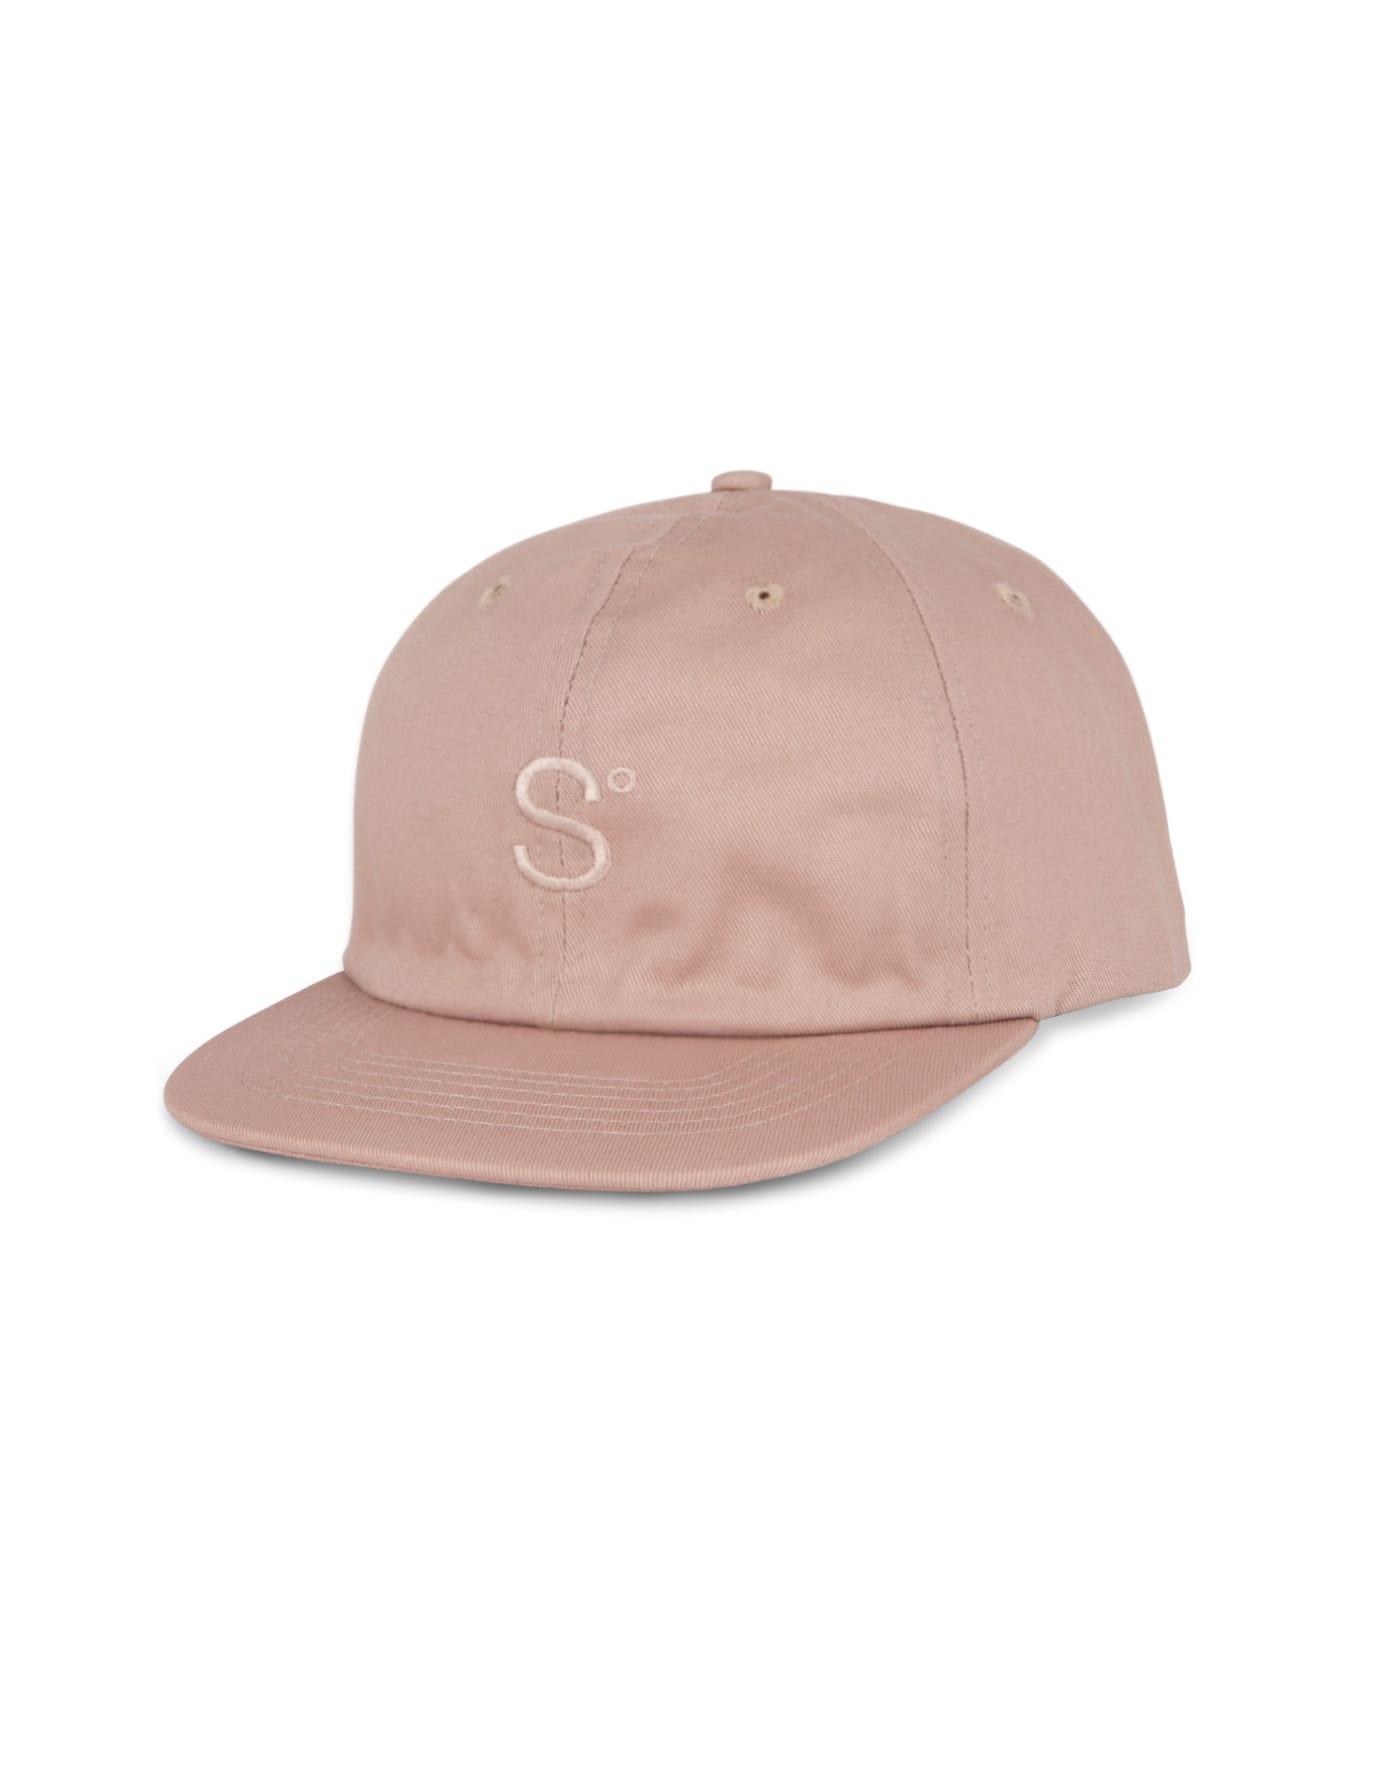 Nº2 Salmon Hat